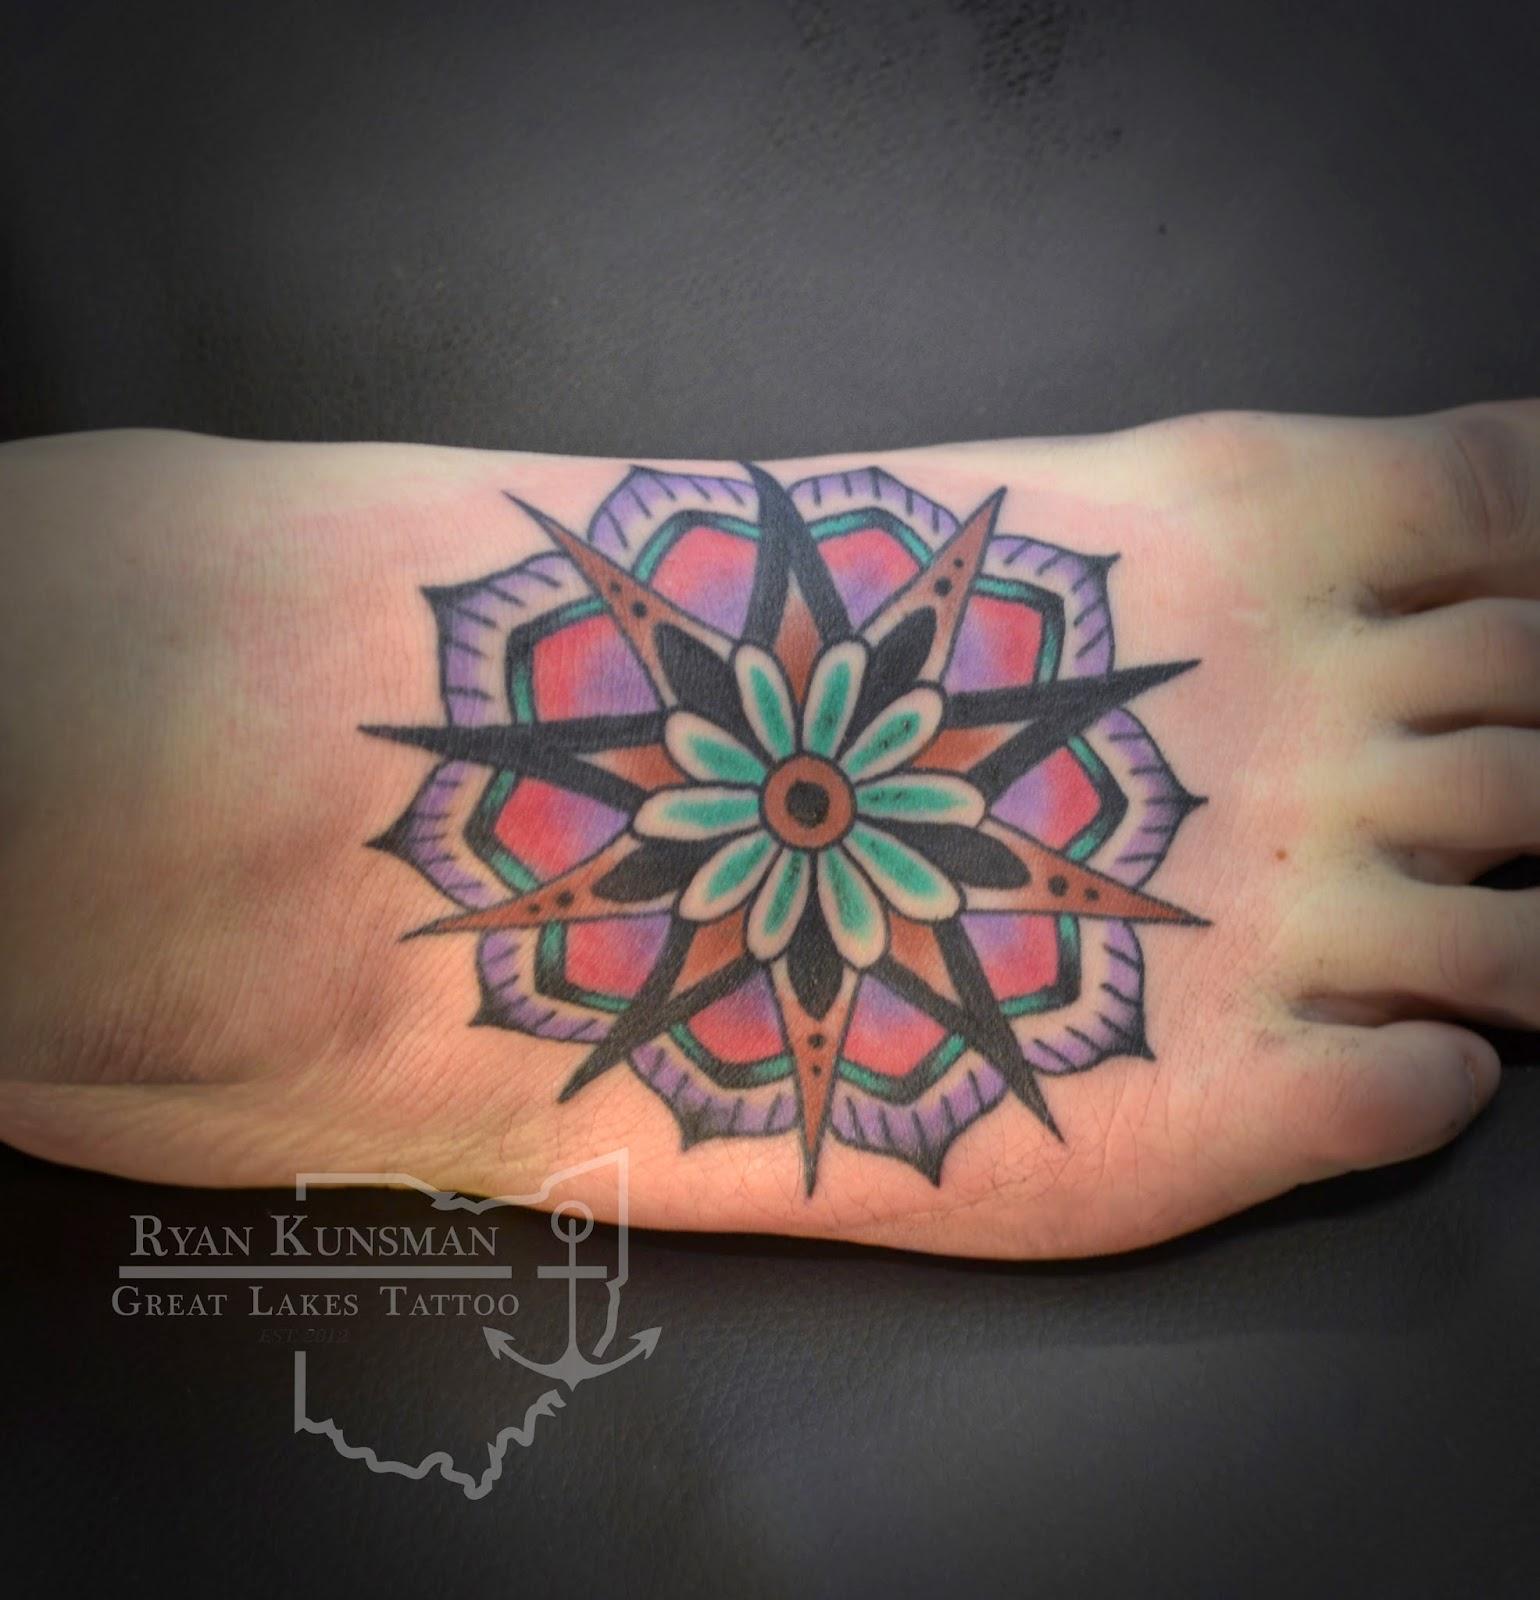 great lakes tattoo